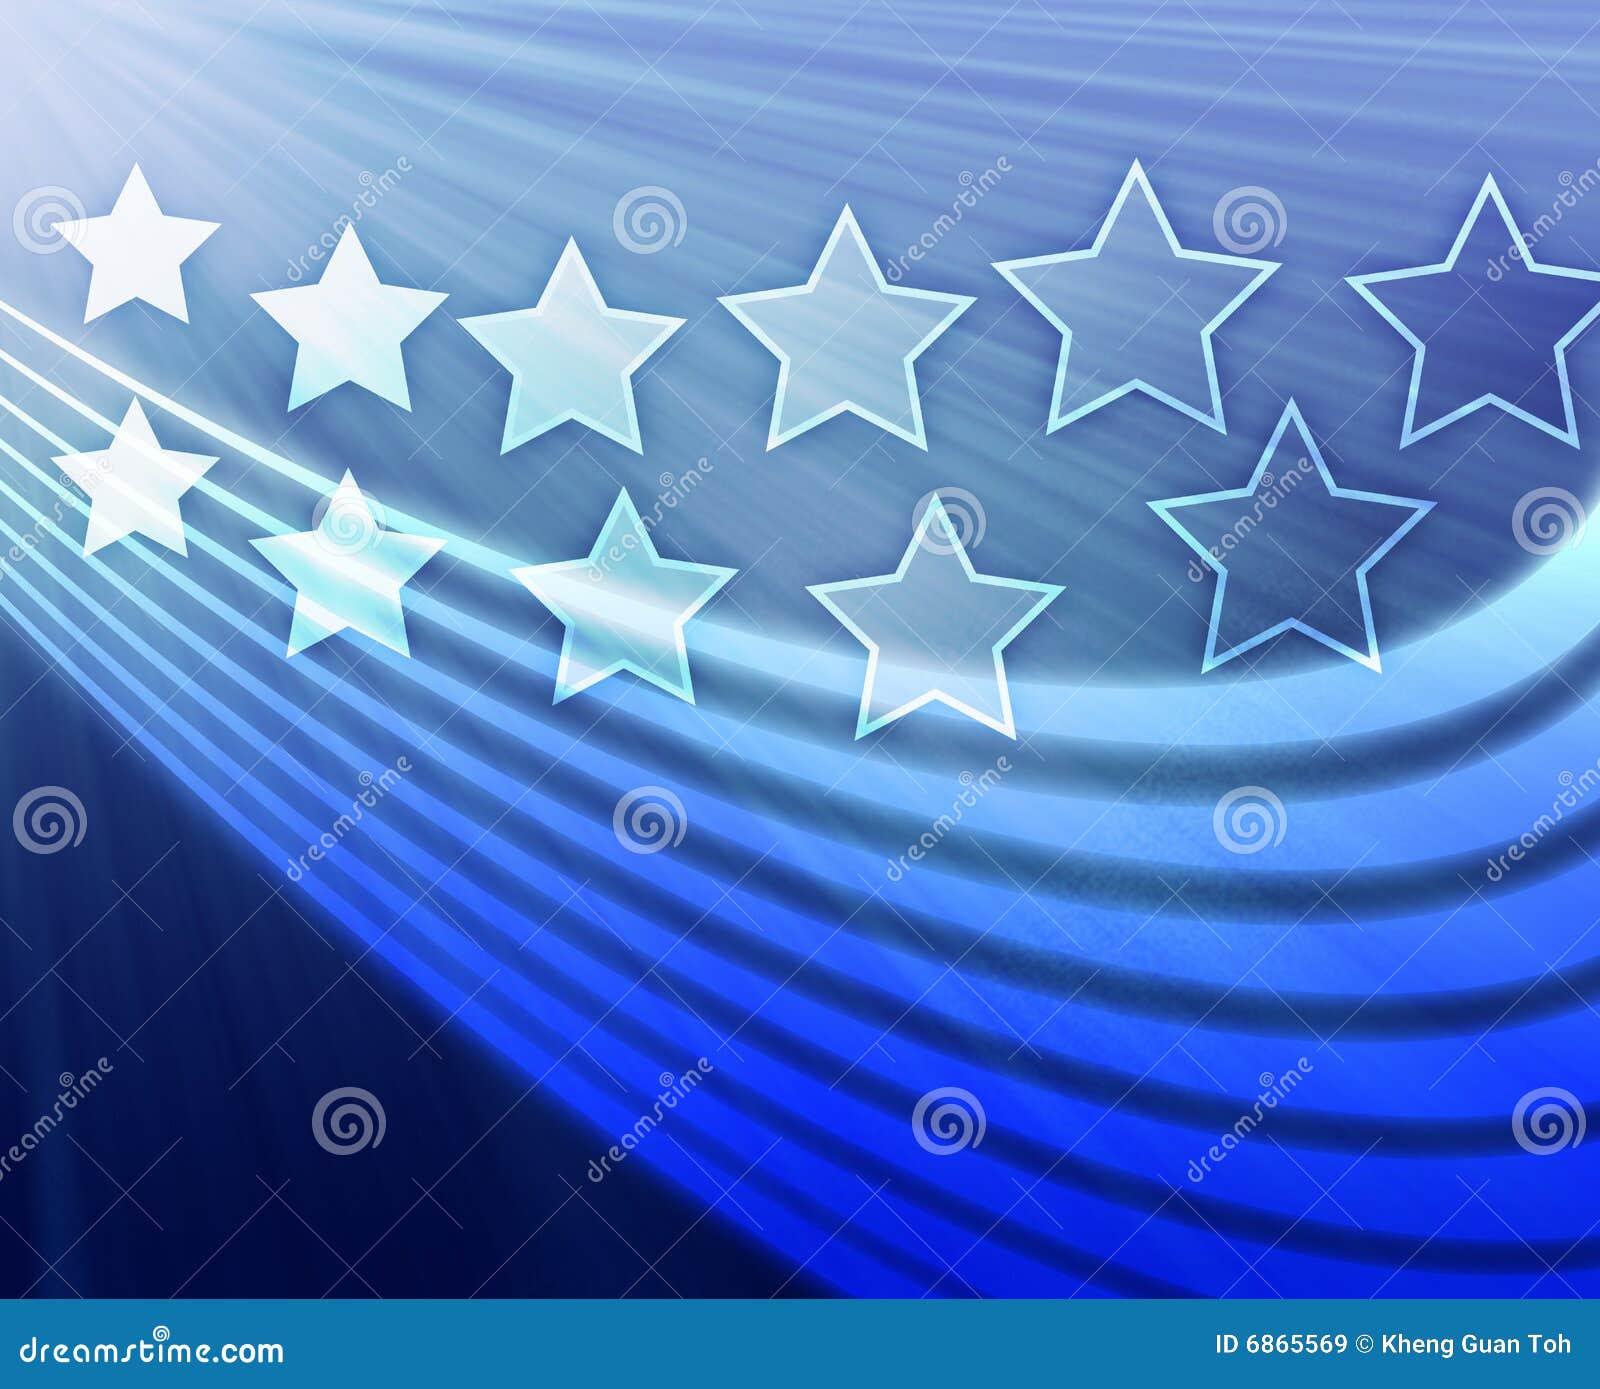 нашивки звезд